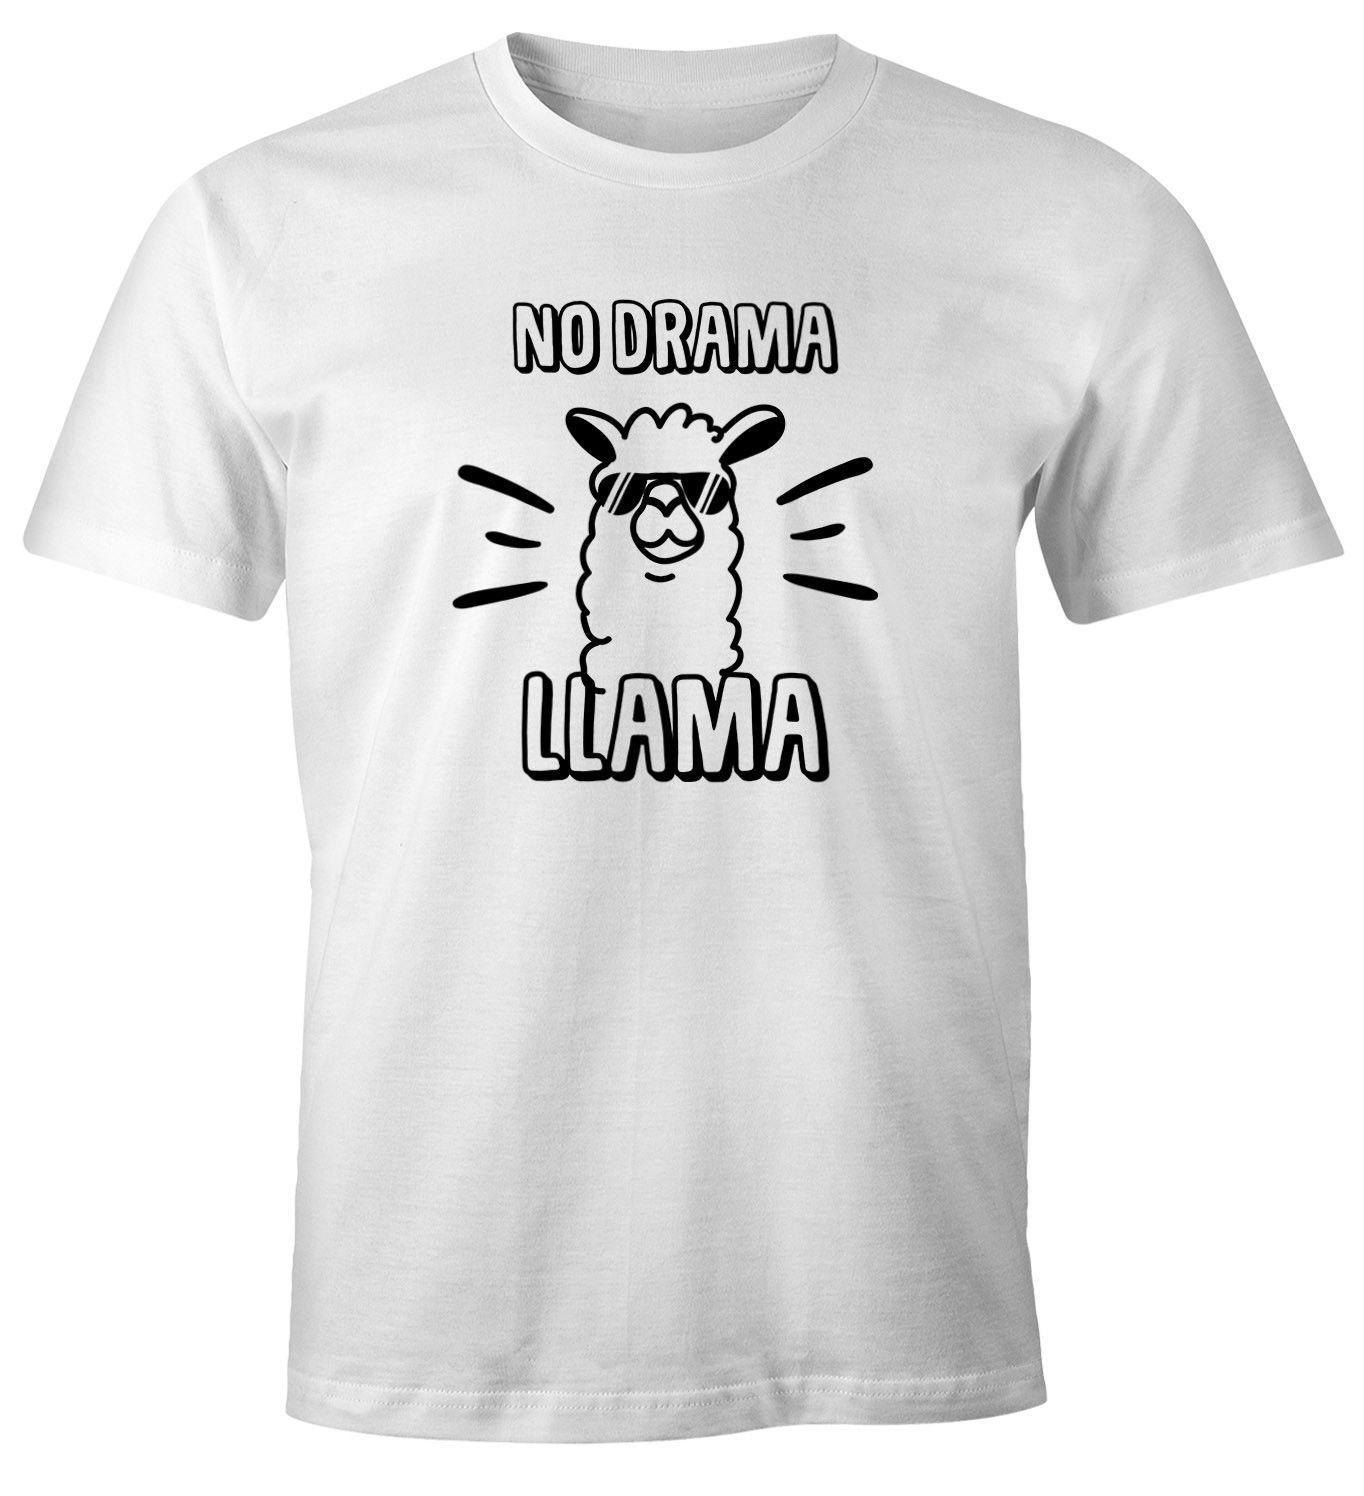 buy popular 7f9a1 445a2 US $11.04 15% OFF|Herren T Shirt No drama Llama Lama Spruch Spruche Quote  Fun Shirt Moonworks Hip Hop Novelty T Shirts Men'S Brand Clothing 2018-in  ...